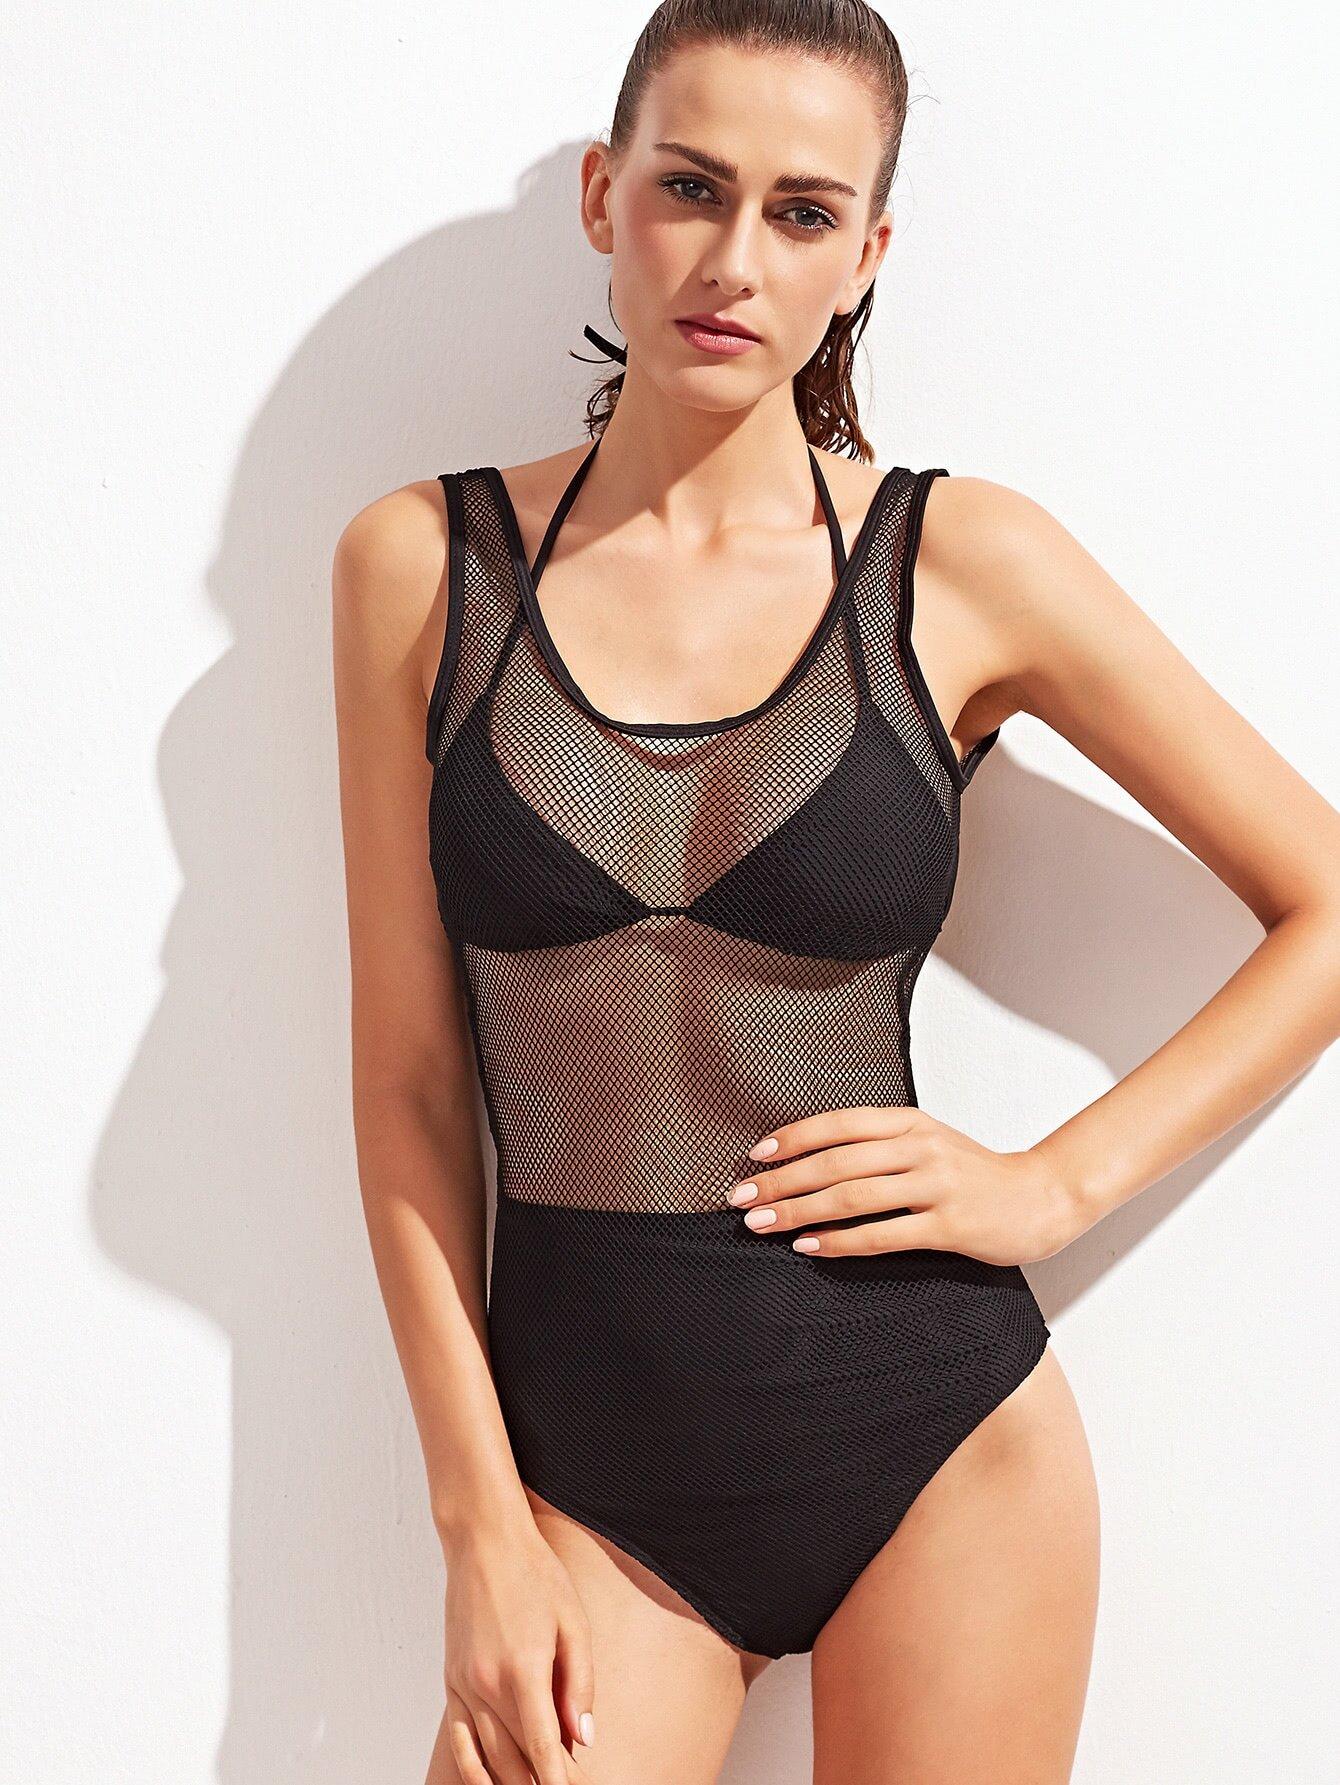 Fishnet Panel Scoop Swimsuit With Bikini Top swimwear161128308